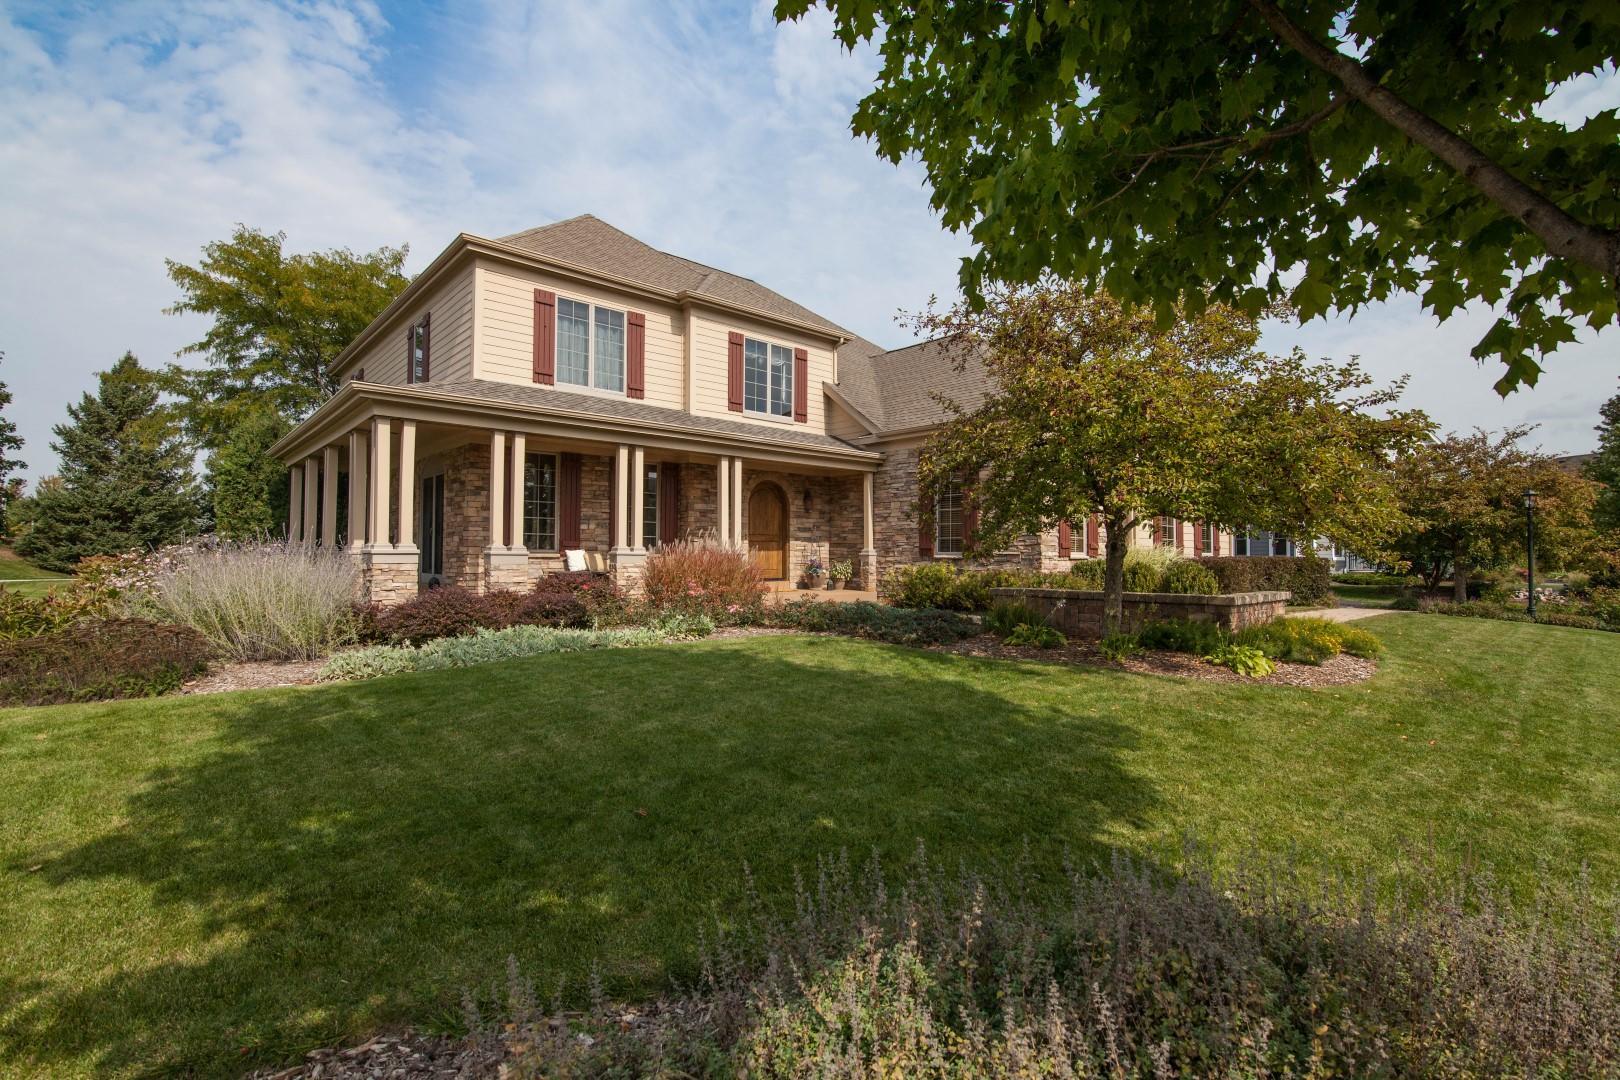 1738 River Lakes Rd N, Oconomowoc, Wisconsin 53066, 4 Bedrooms Bedrooms, ,2 BathroomsBathrooms,Single-Family,For Sale,River Lakes Rd N,1723528